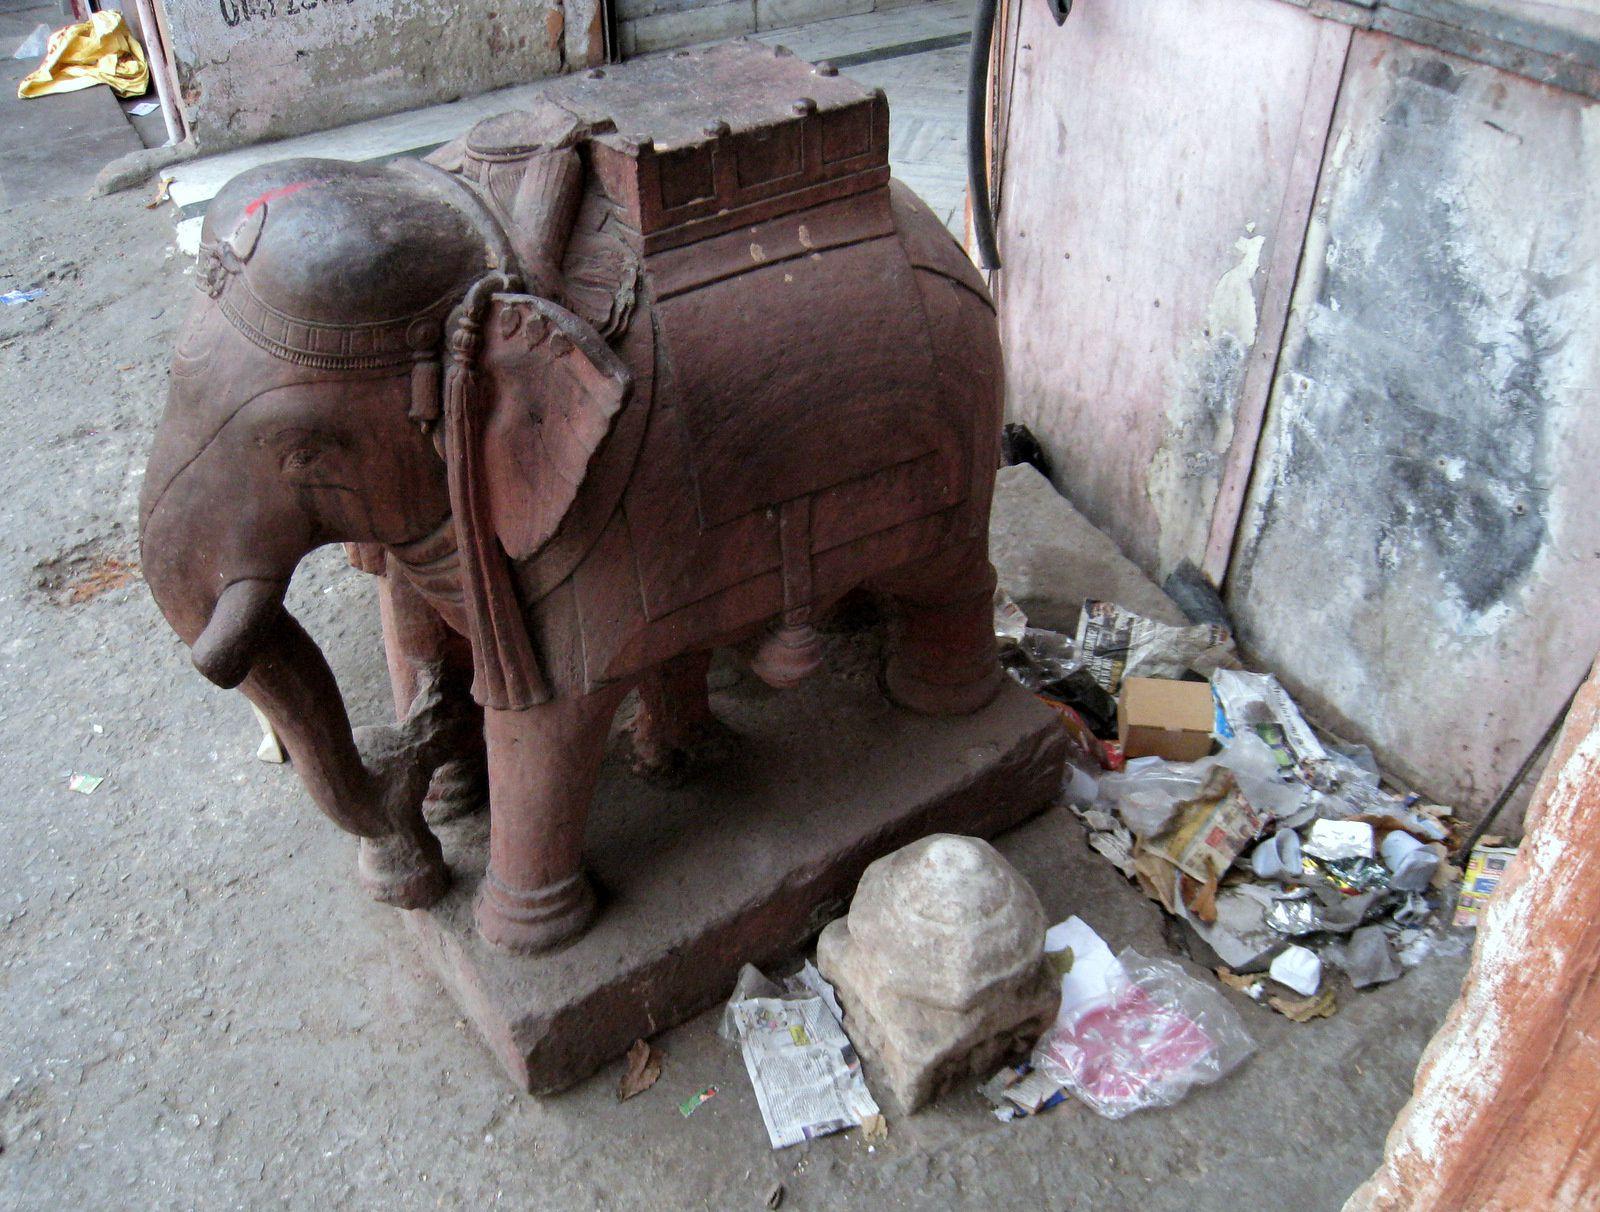 Transports de marchandises à Jaipur, Rajasthan (Inde)